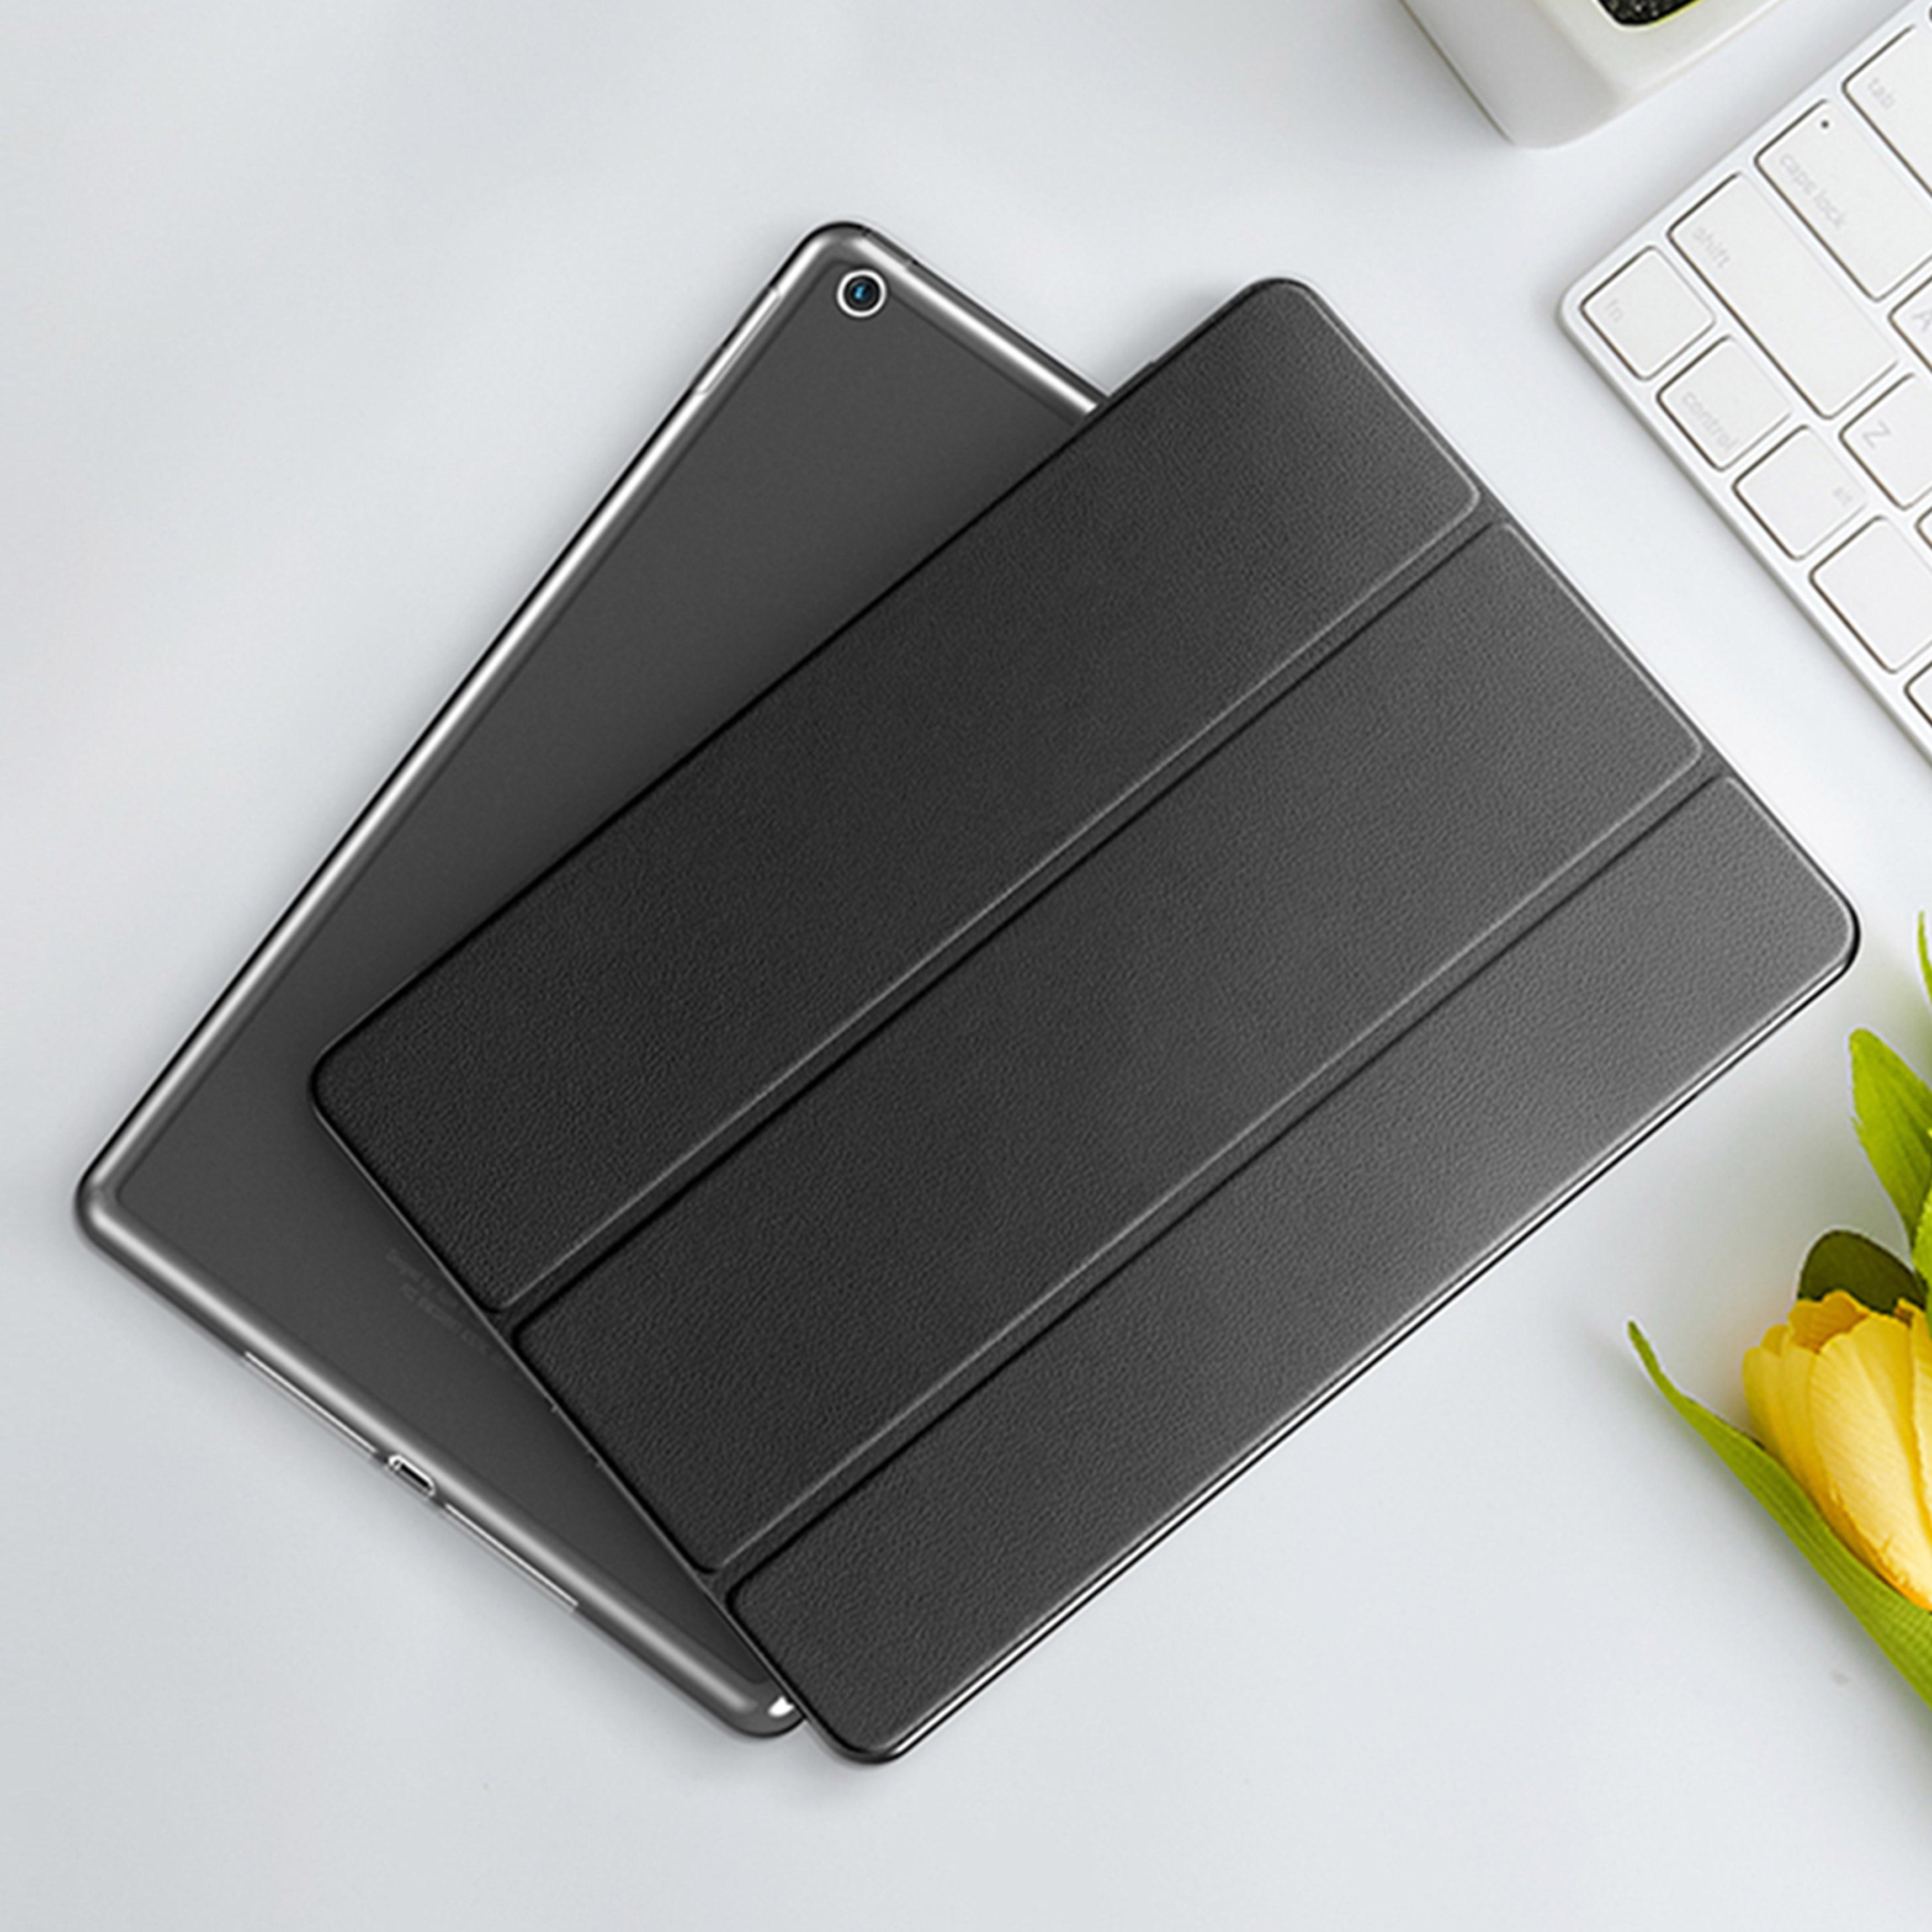 Funda para Huawei MediaPad T5 10 AGS2-W09/L09/L03/10,1 pulgadas tableta magnética funda inteligente para MediaPad T5 10 fundas stand shell